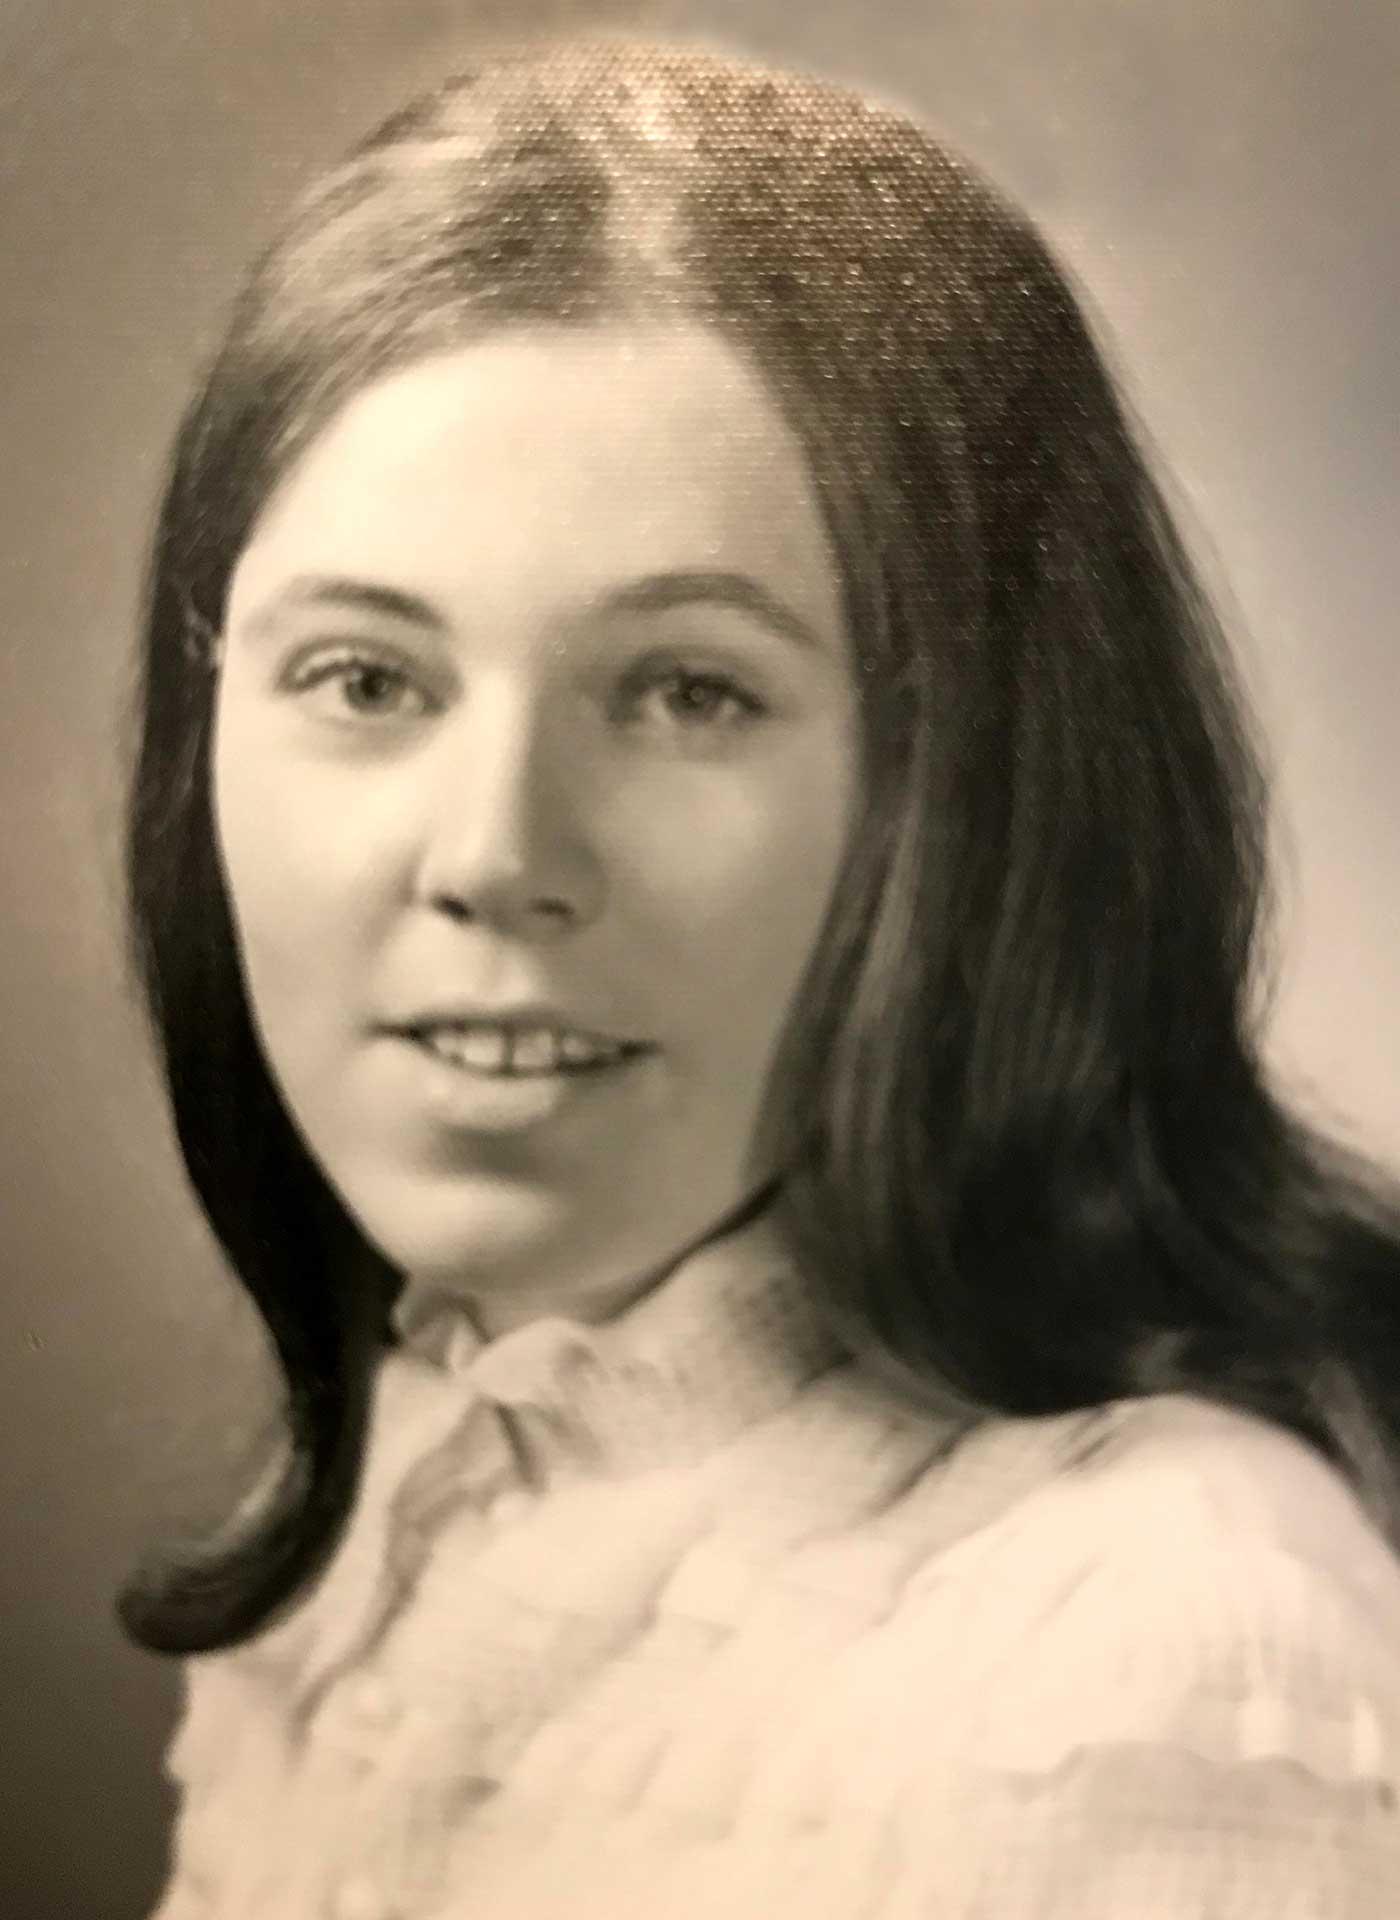 Young Dorinda